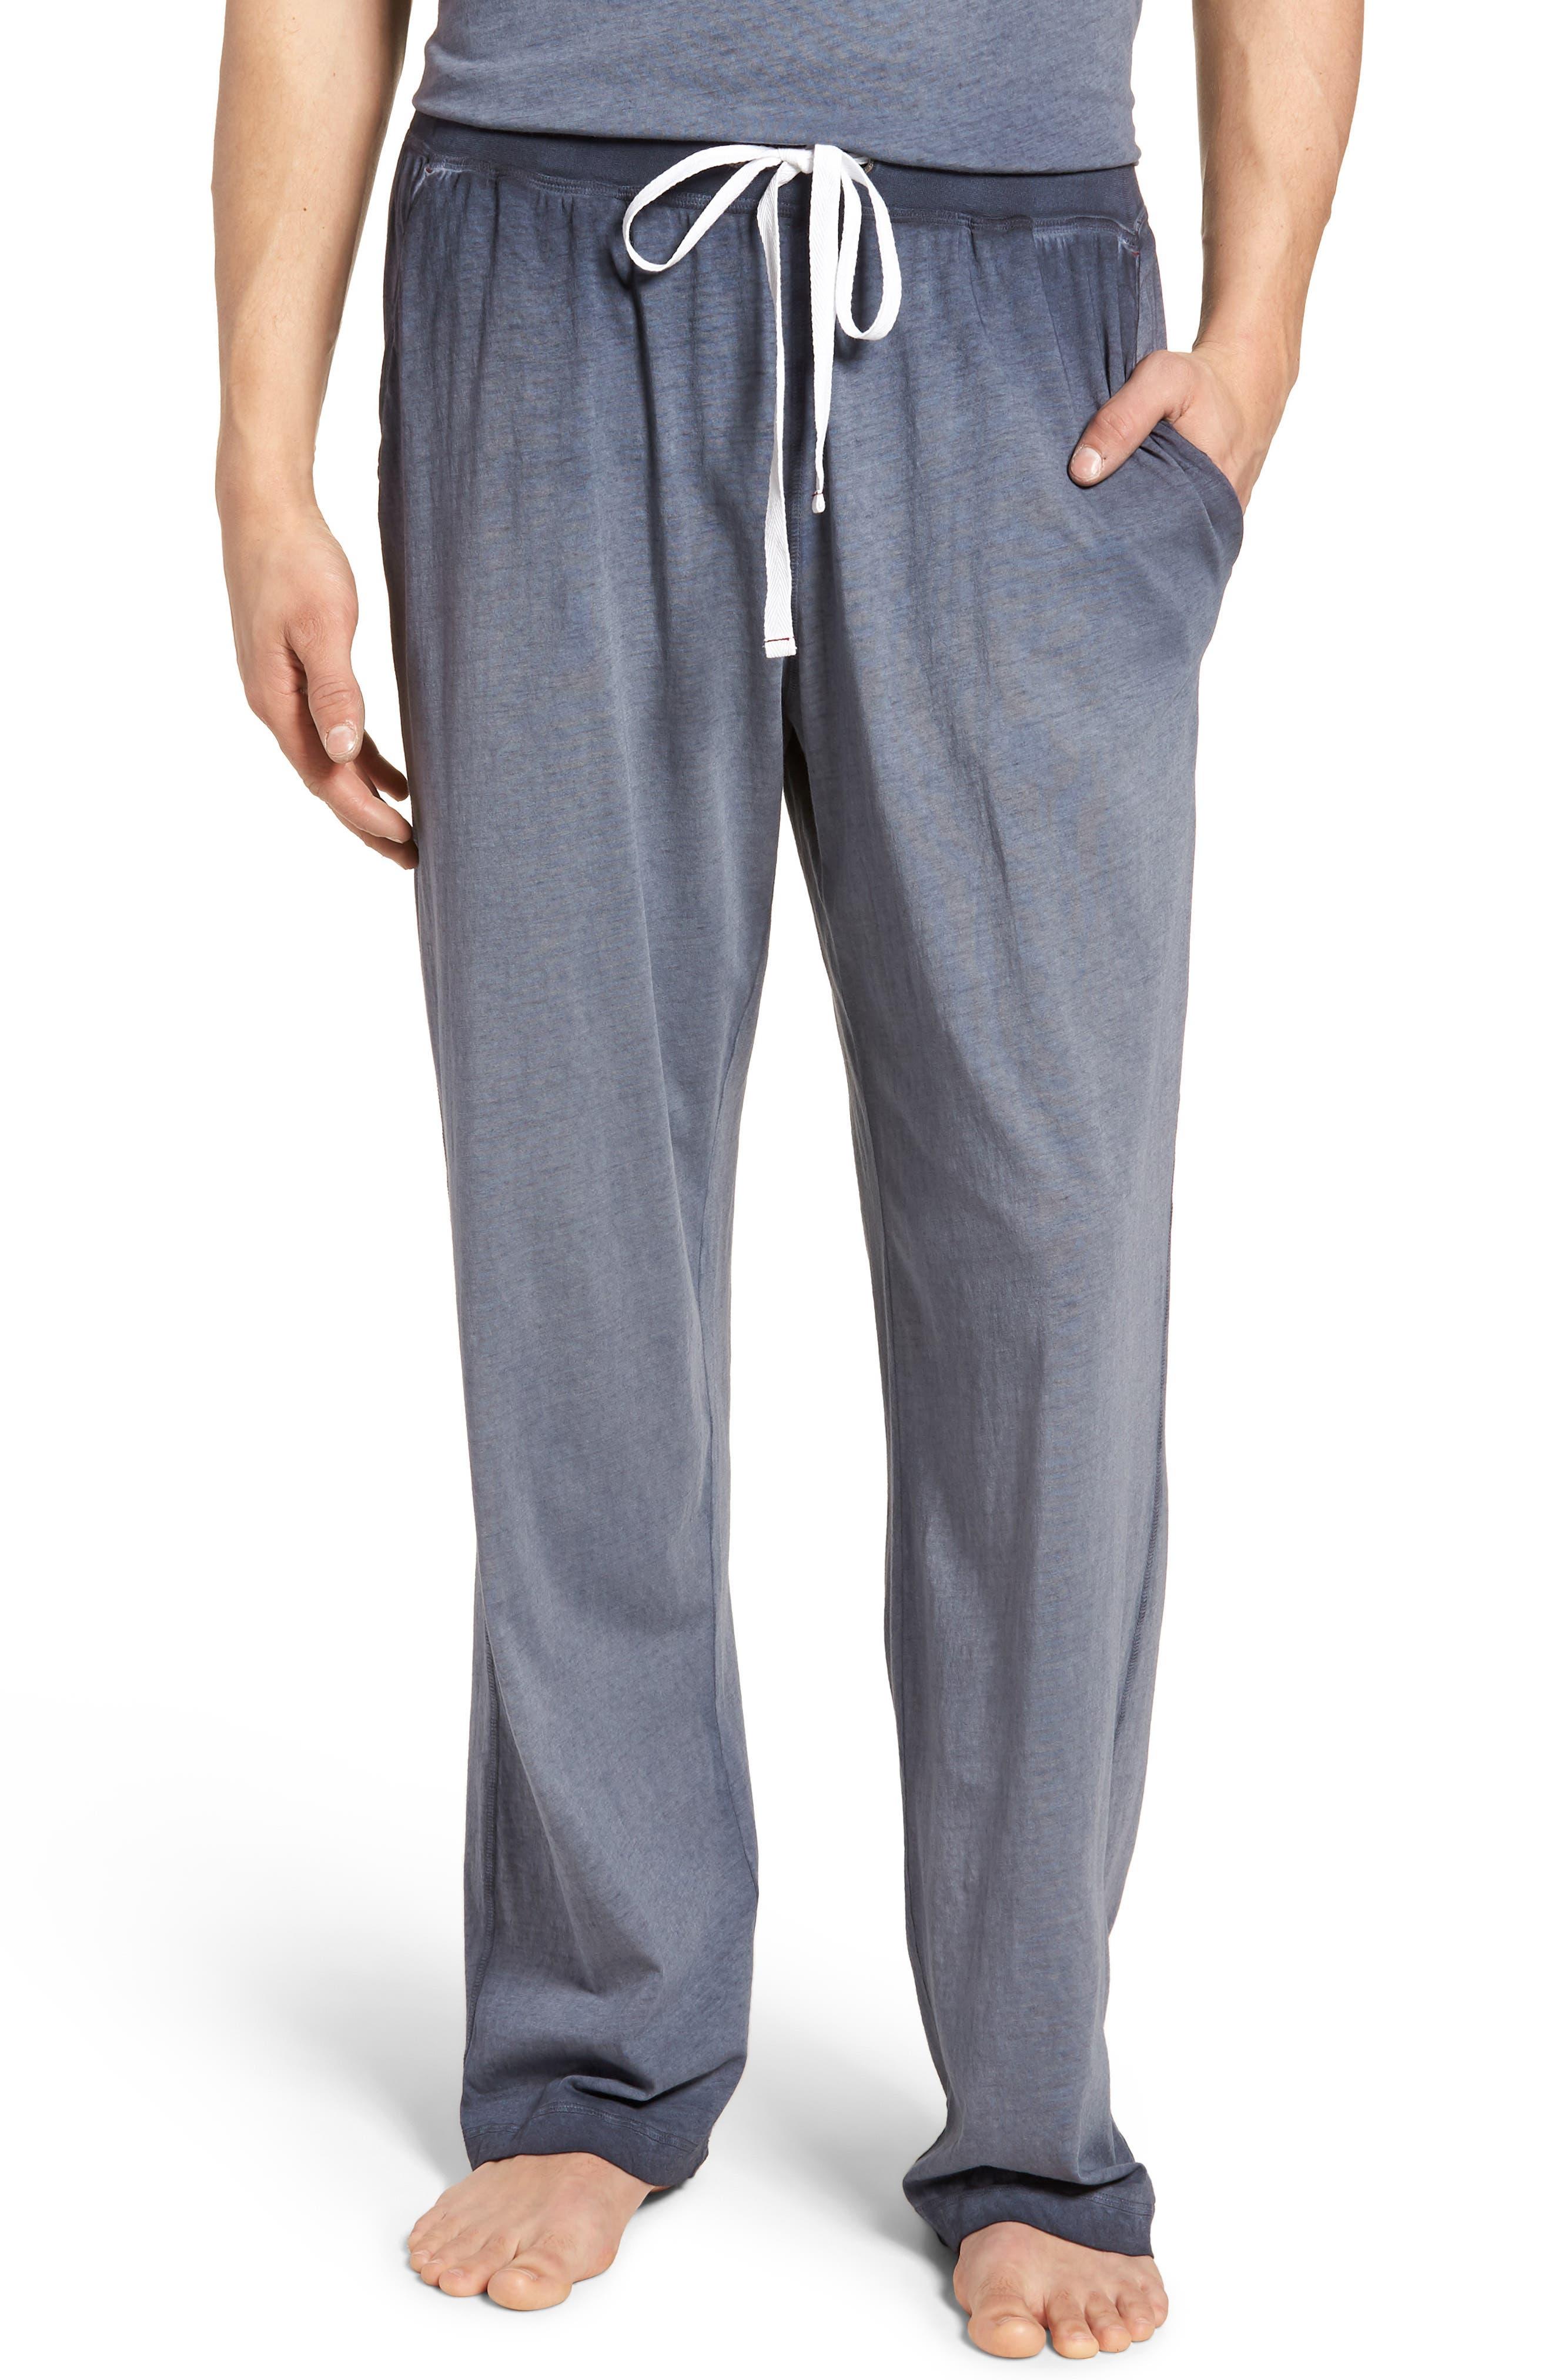 Cotton Lounge Pants,                             Main thumbnail 1, color,                             Navy